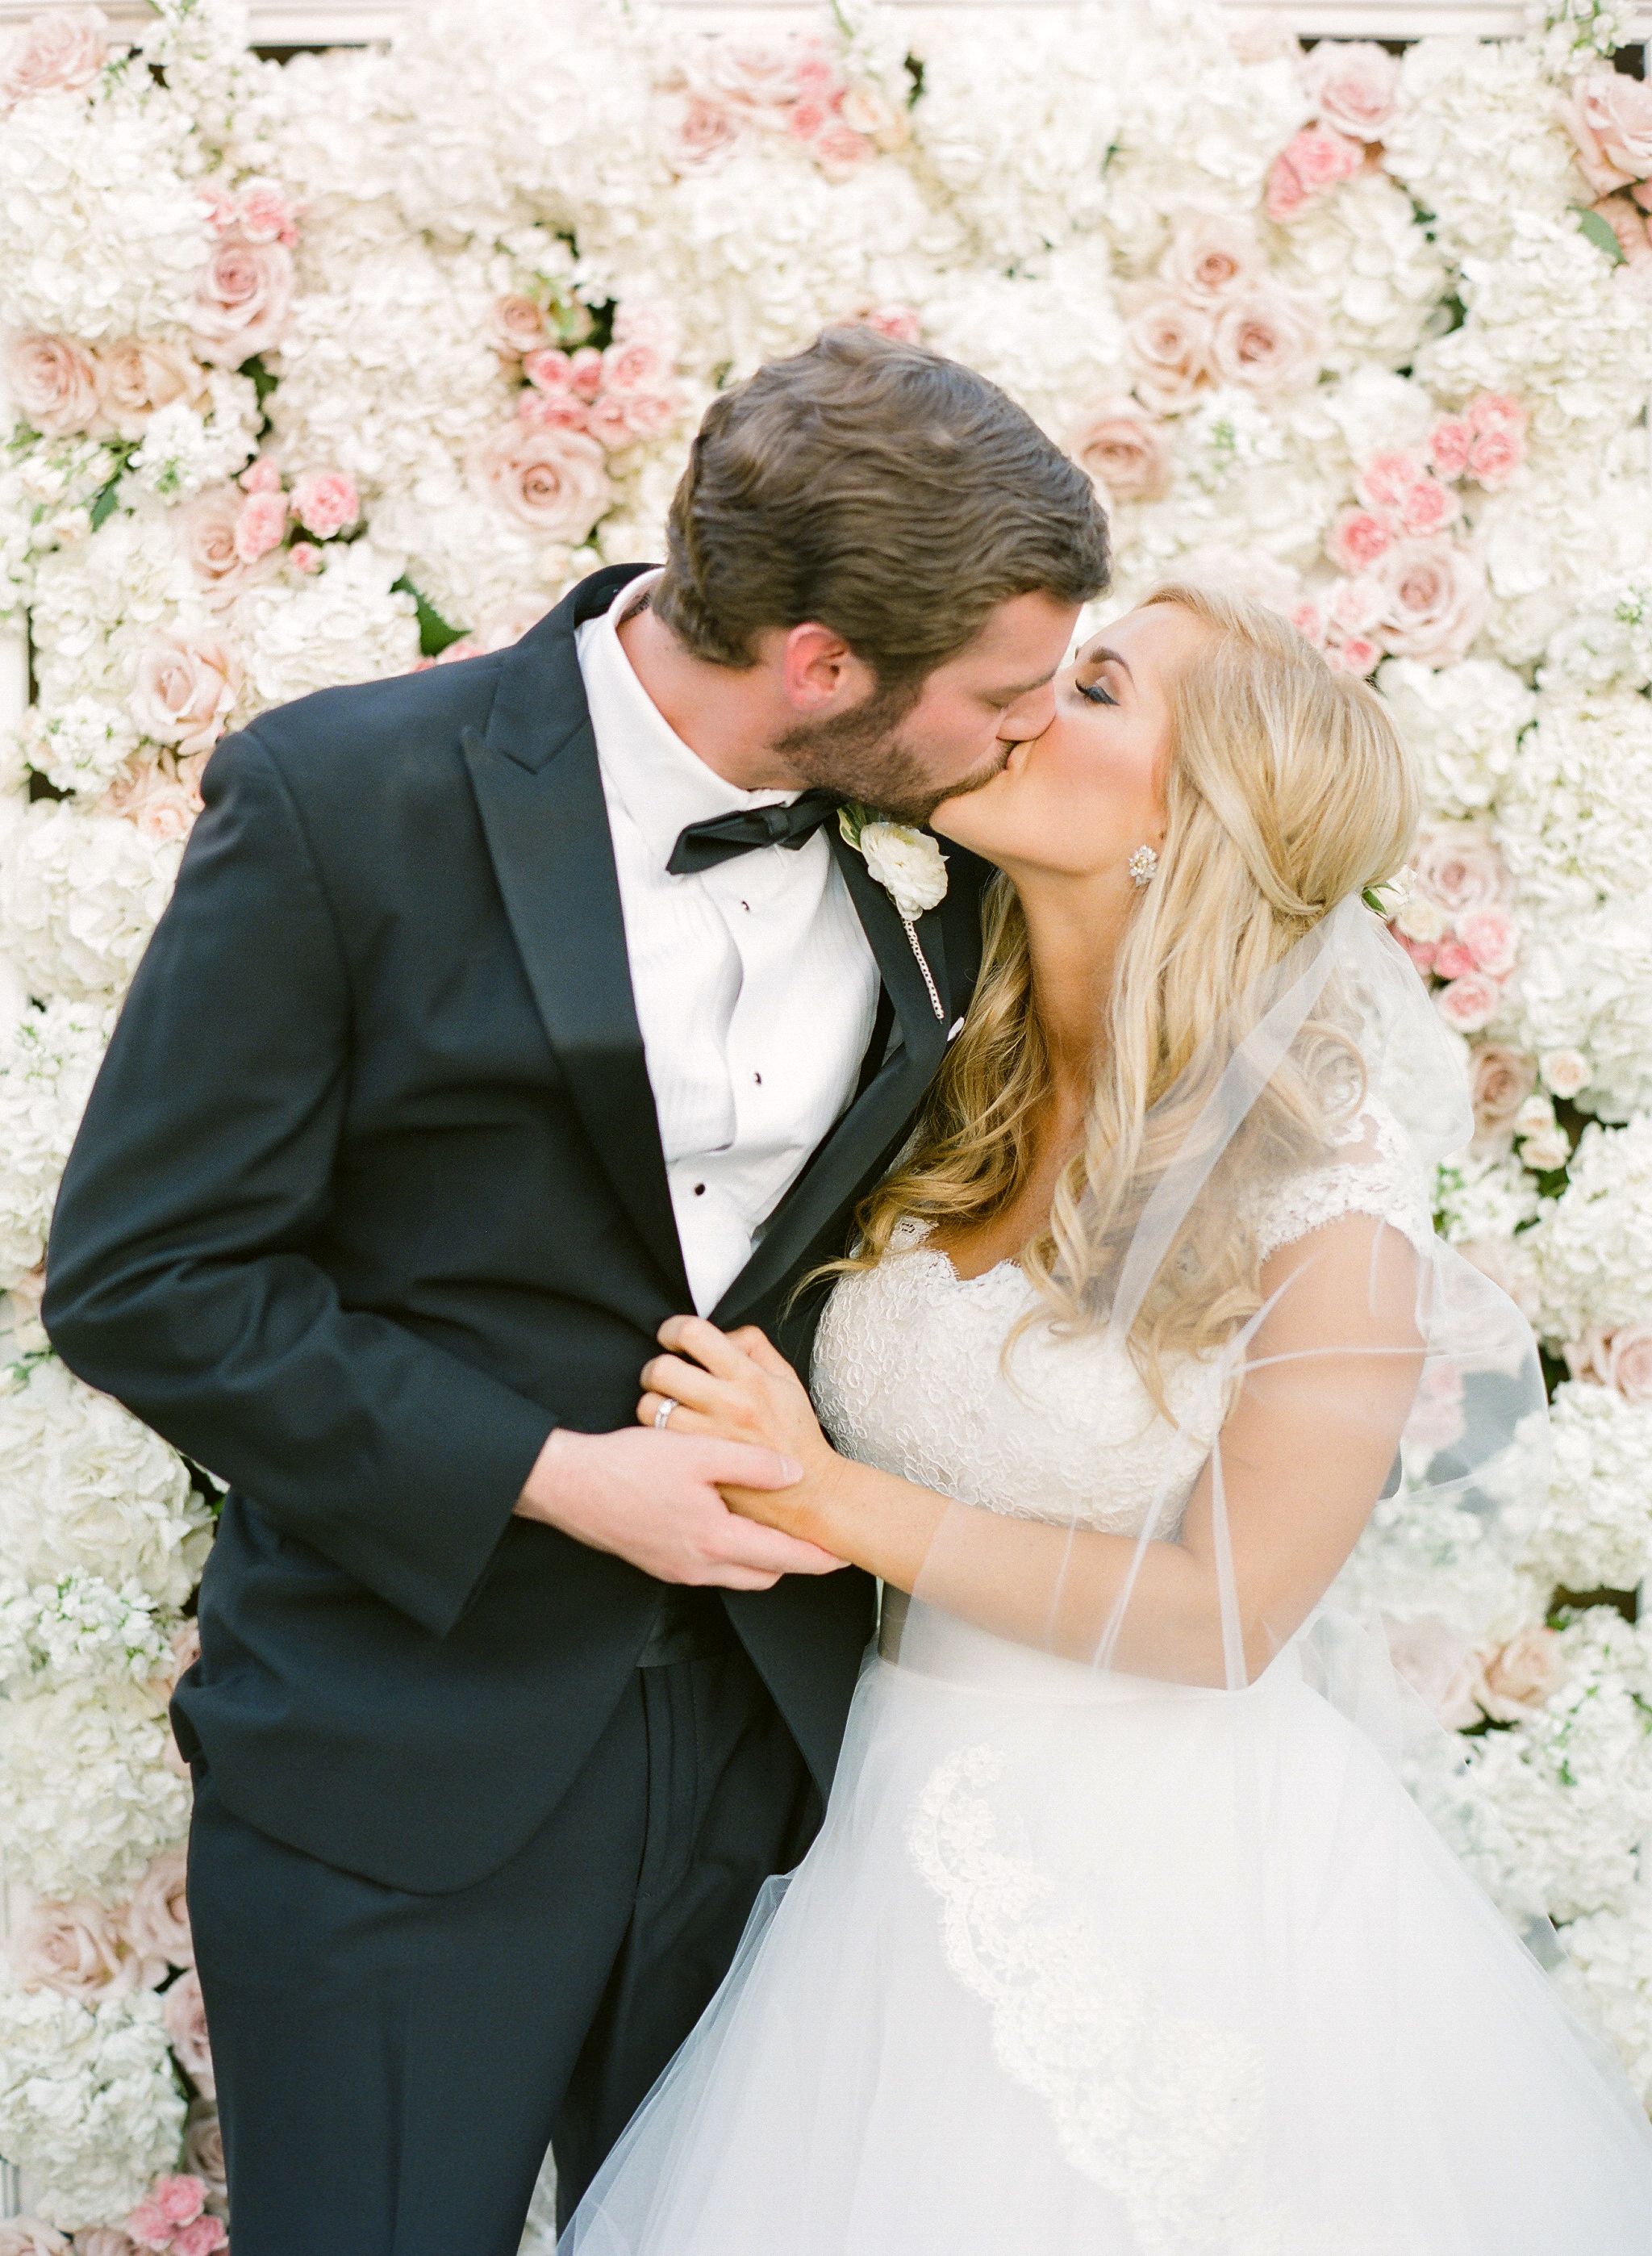 Ceci_New_York_Florida_Wedding_Style_Bride_Watercolor_Real_Custom_Luxury_82.jpg